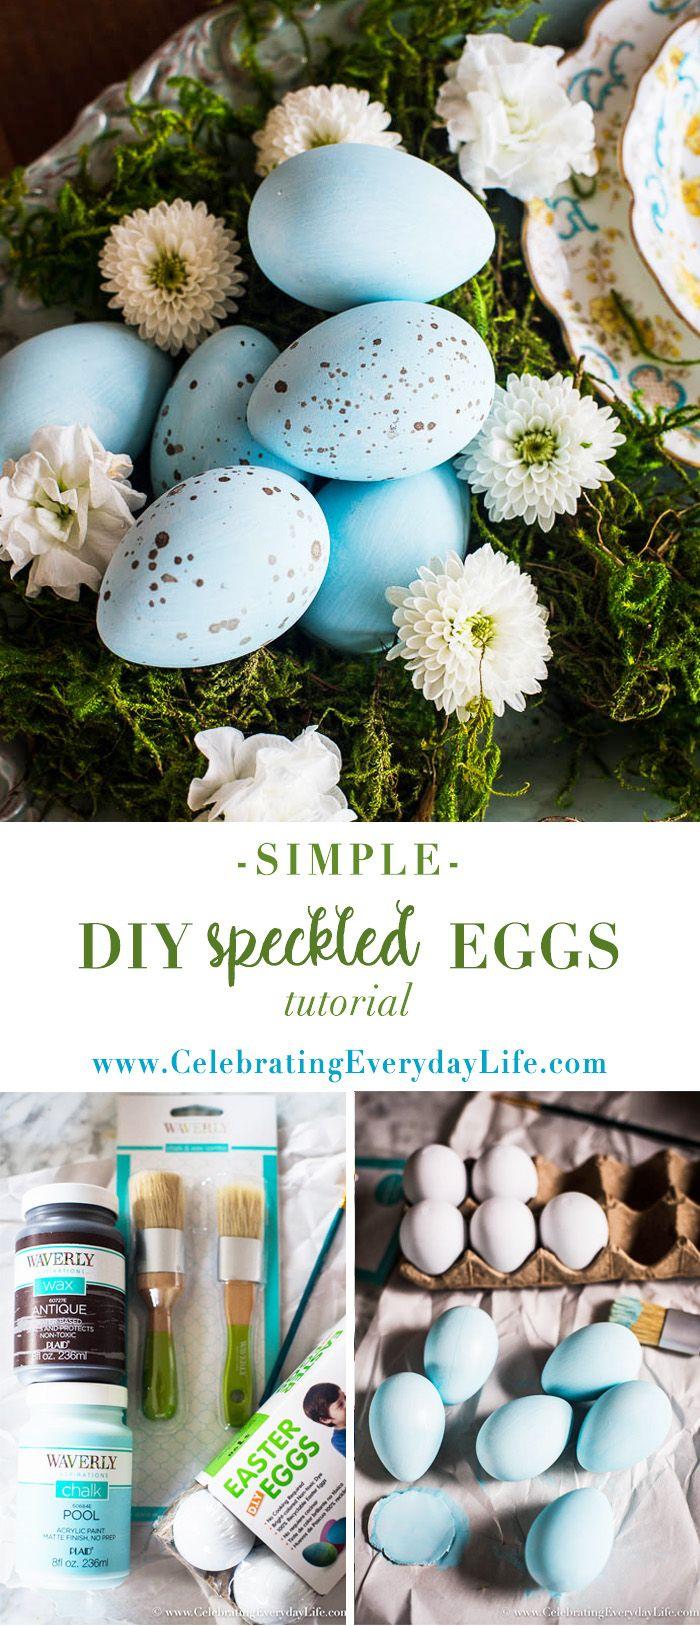 Letu0027s make easy DIY speckled Eggs Not